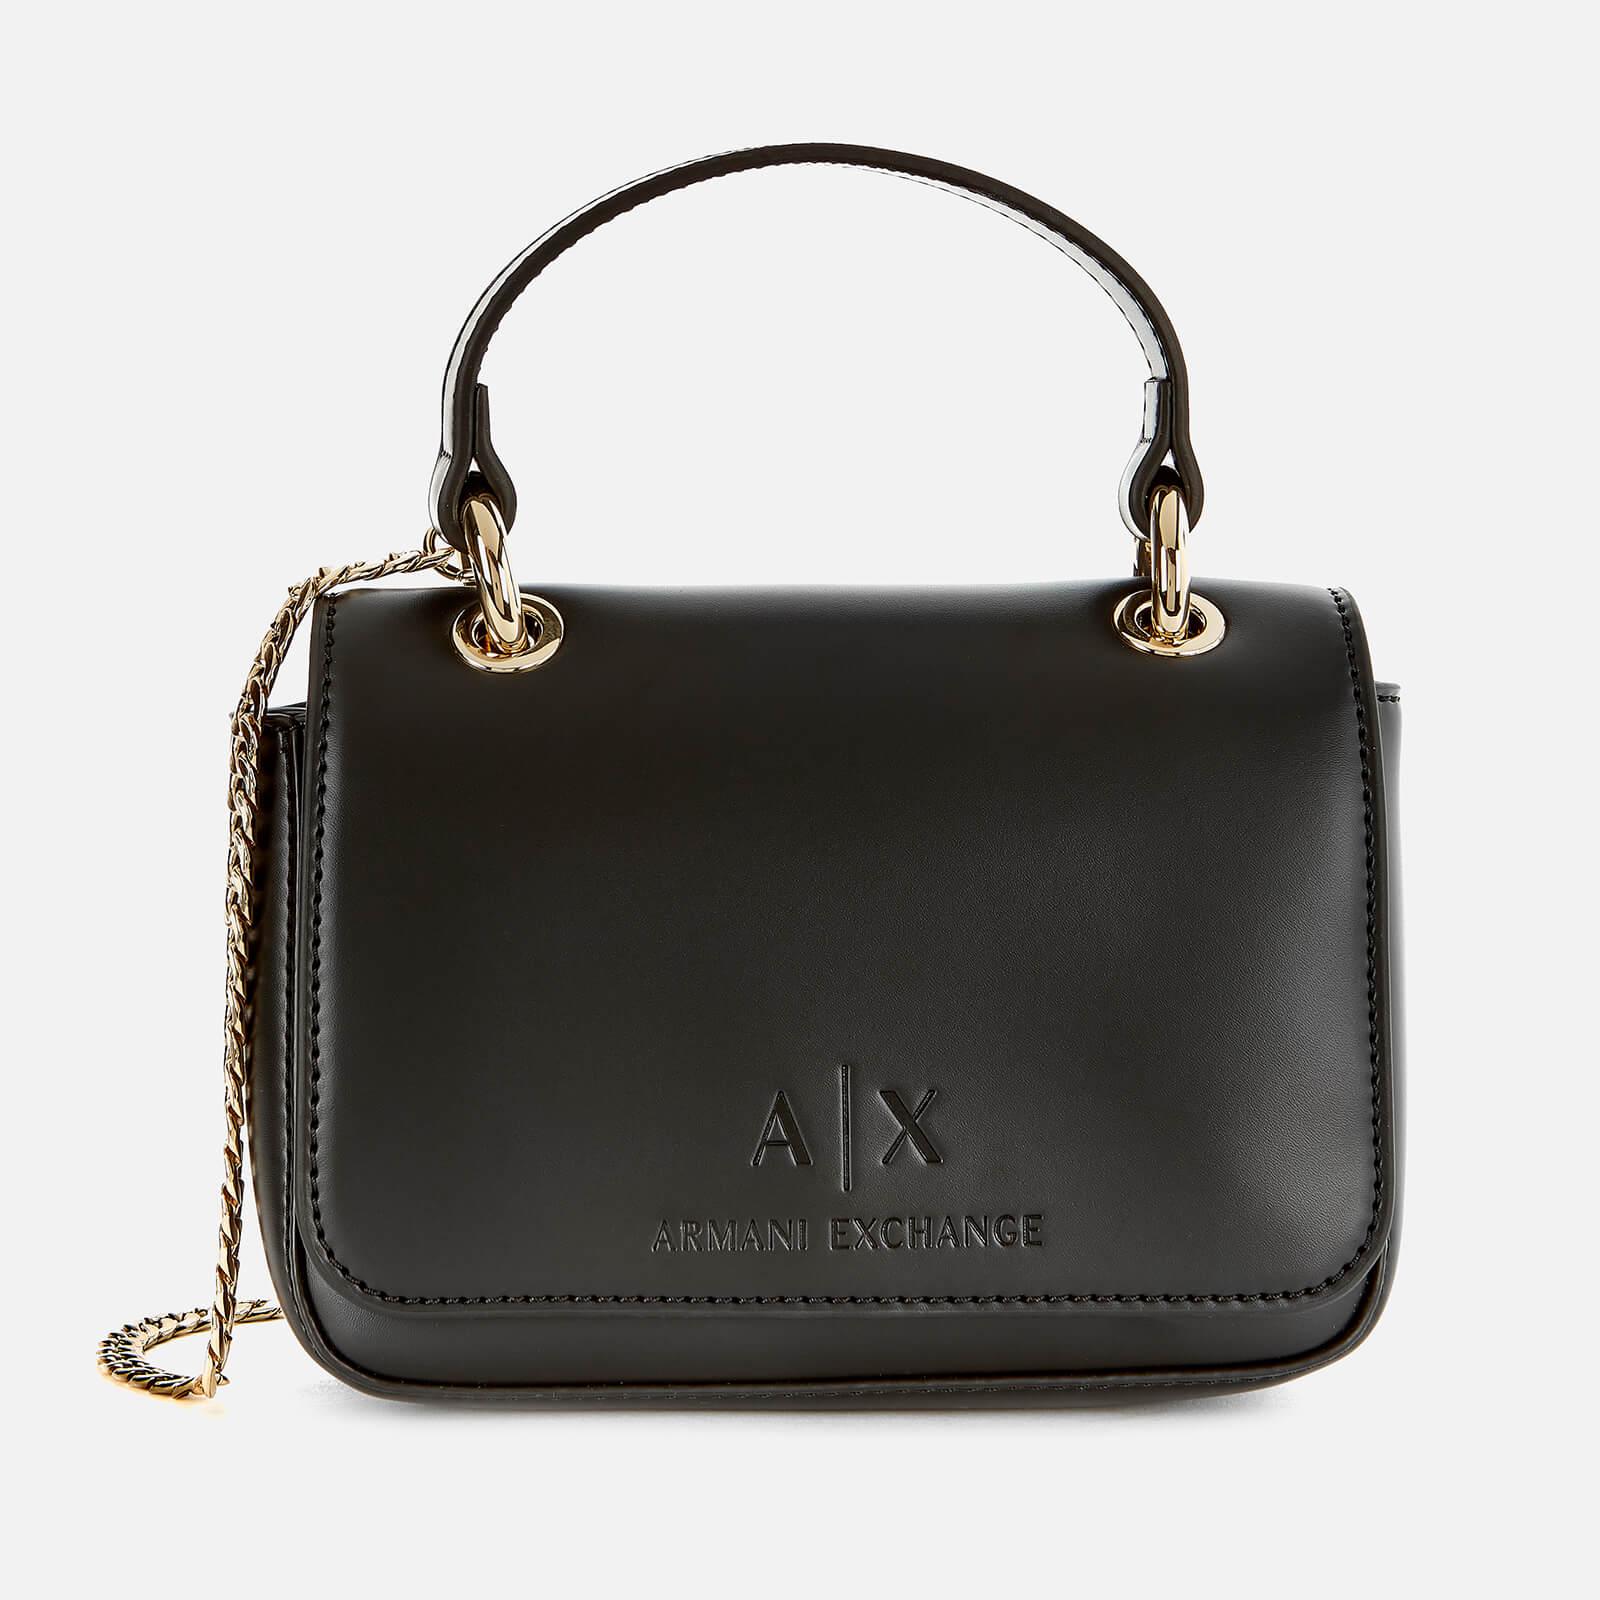 armani exchange women's small cross body bag - black